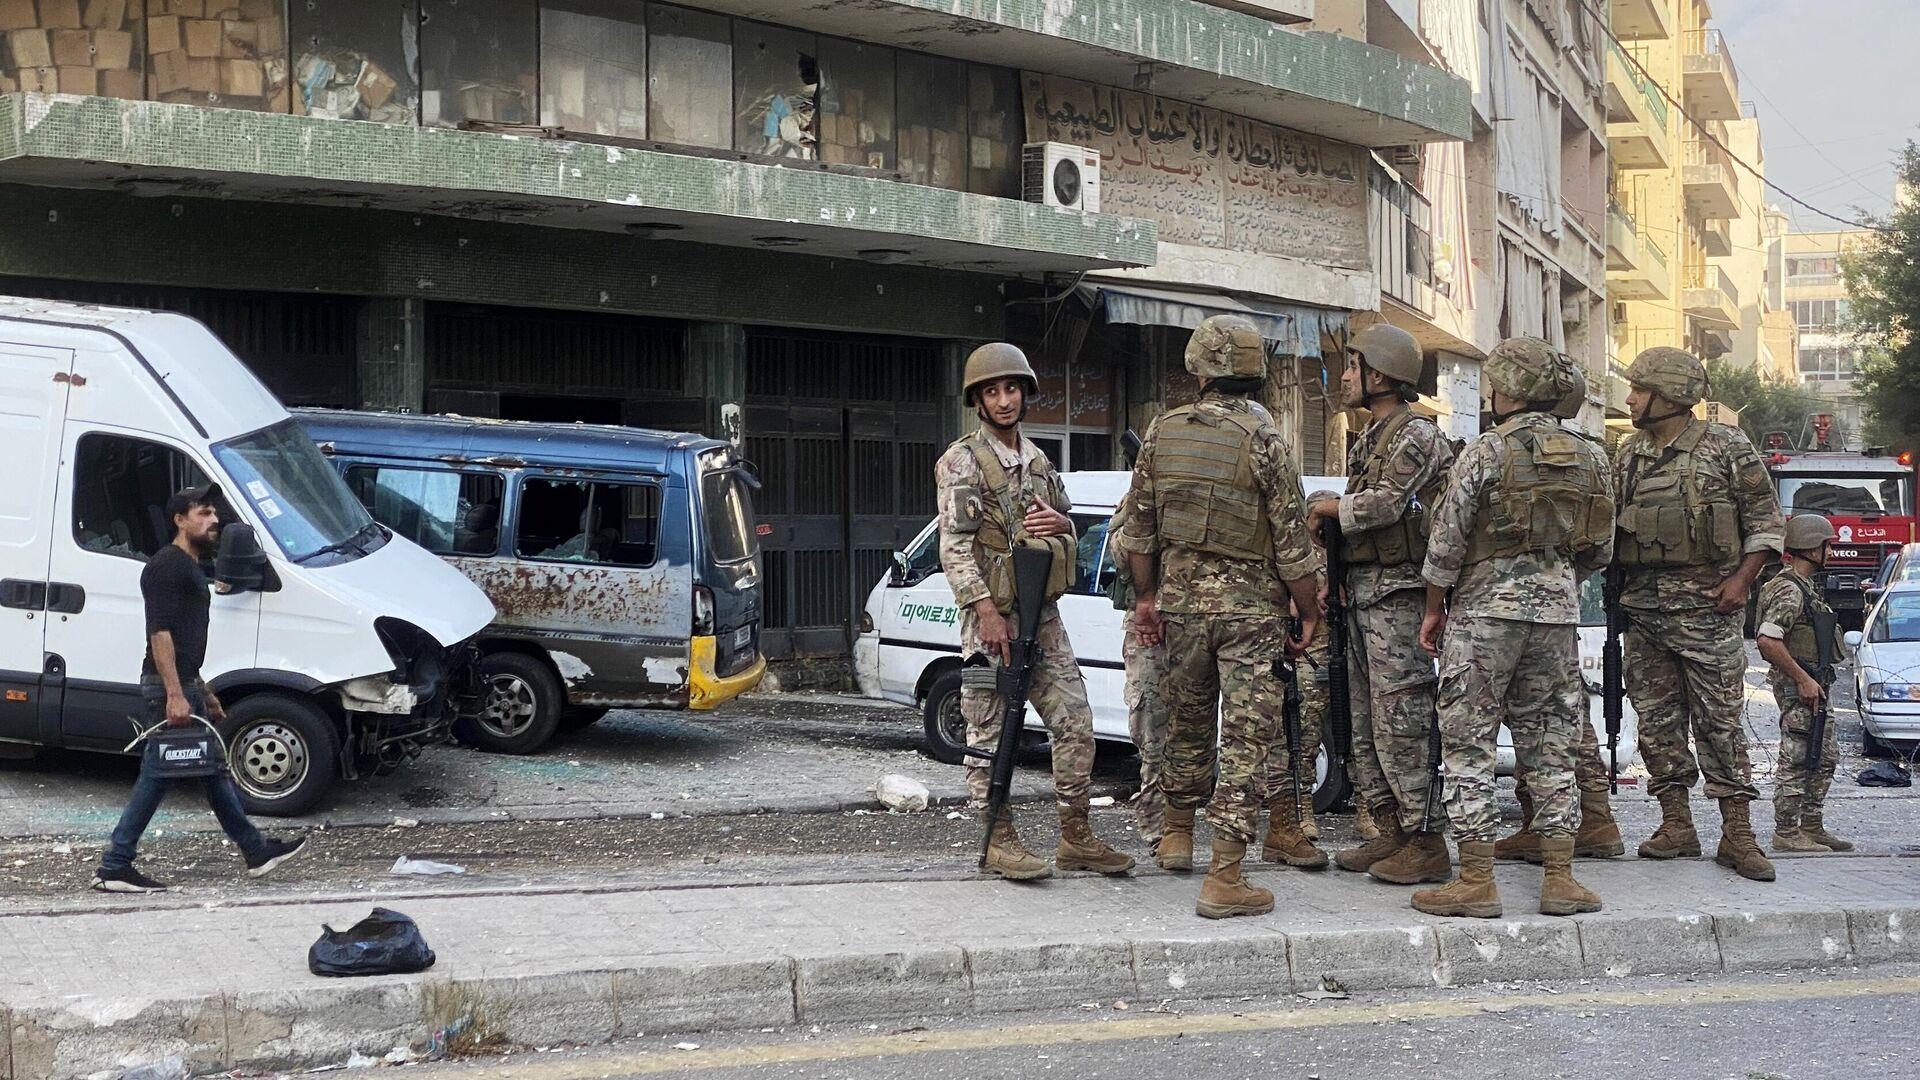 Libanesische Soldaten vor dem Justizpalast. Beirut, 14. Oktober 2021 - SNA, 1920, 14.10.2021